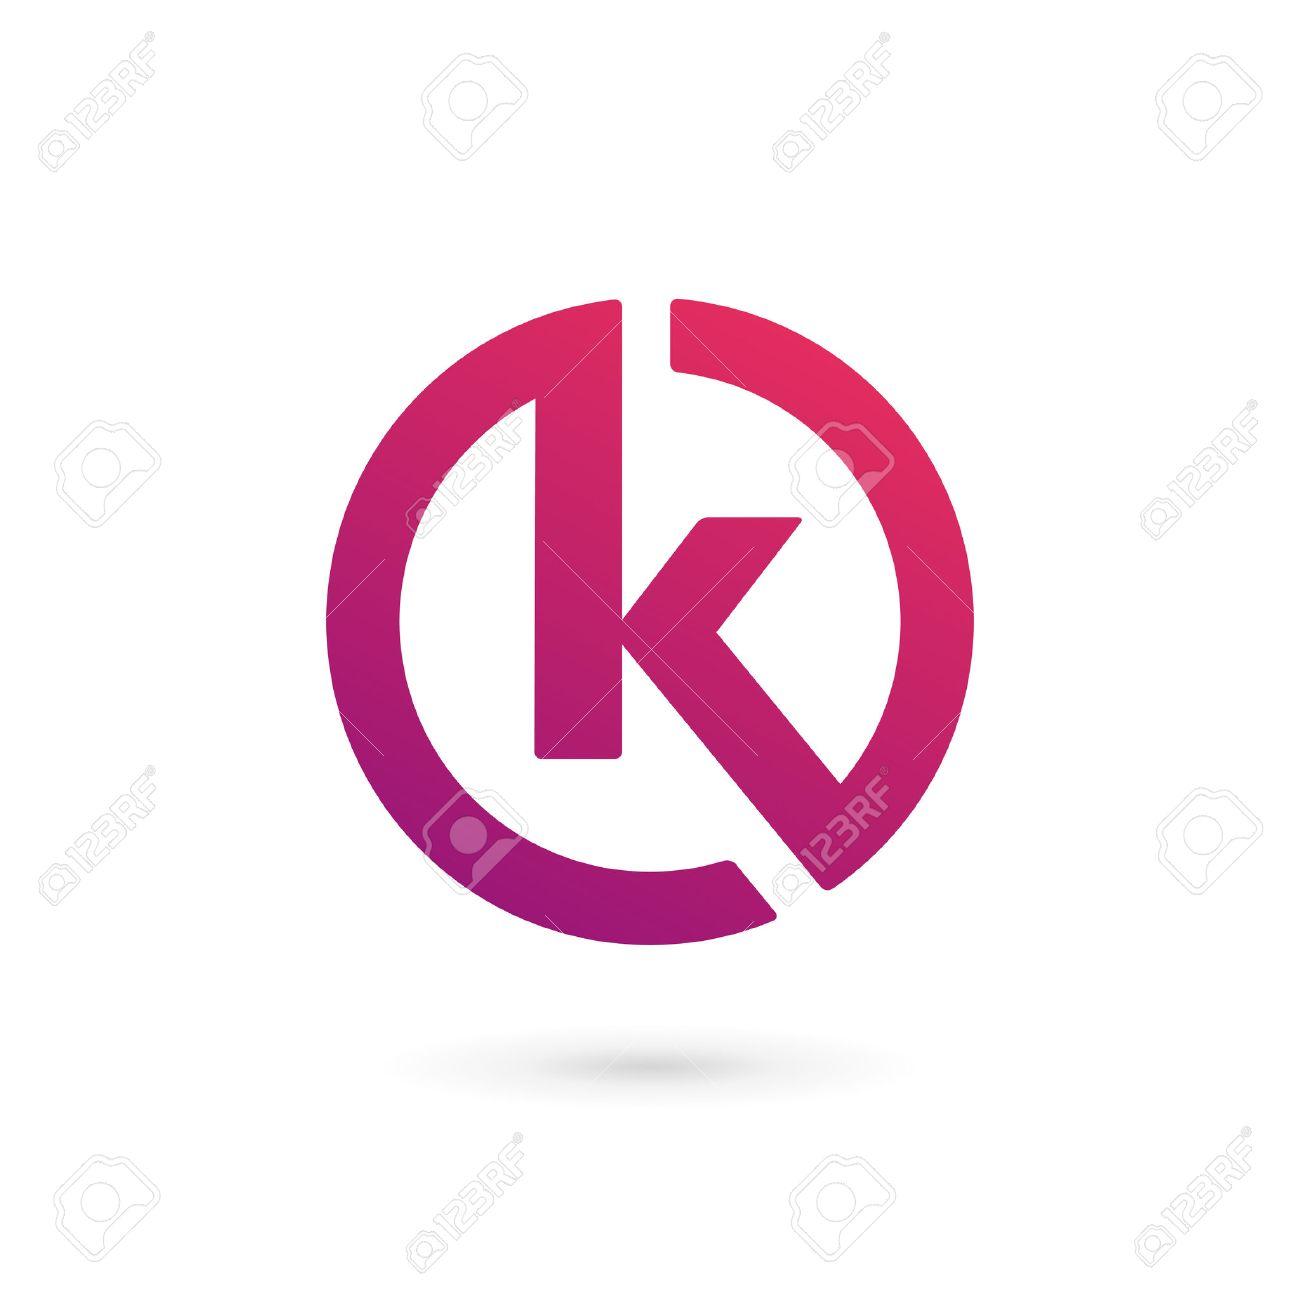 letter k logo icon design template elements stock vector 37966936